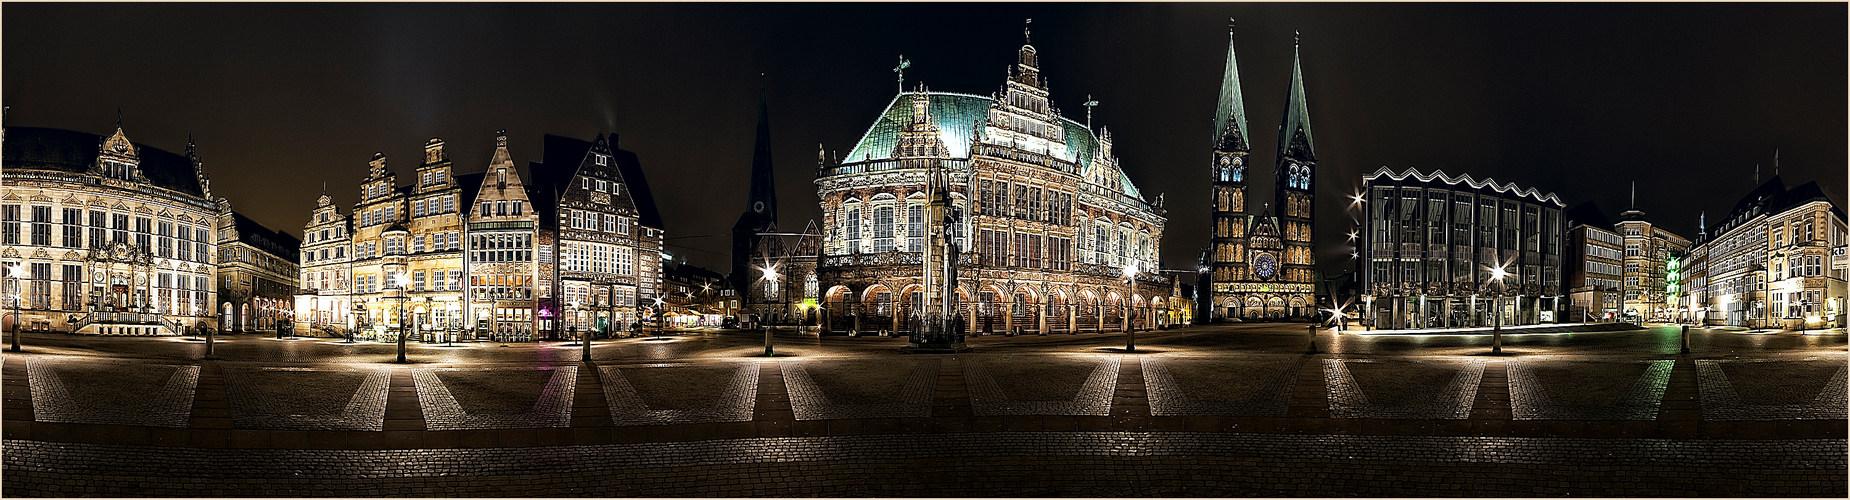 Bremen Fotografie fotografen bremen hausdesigns co